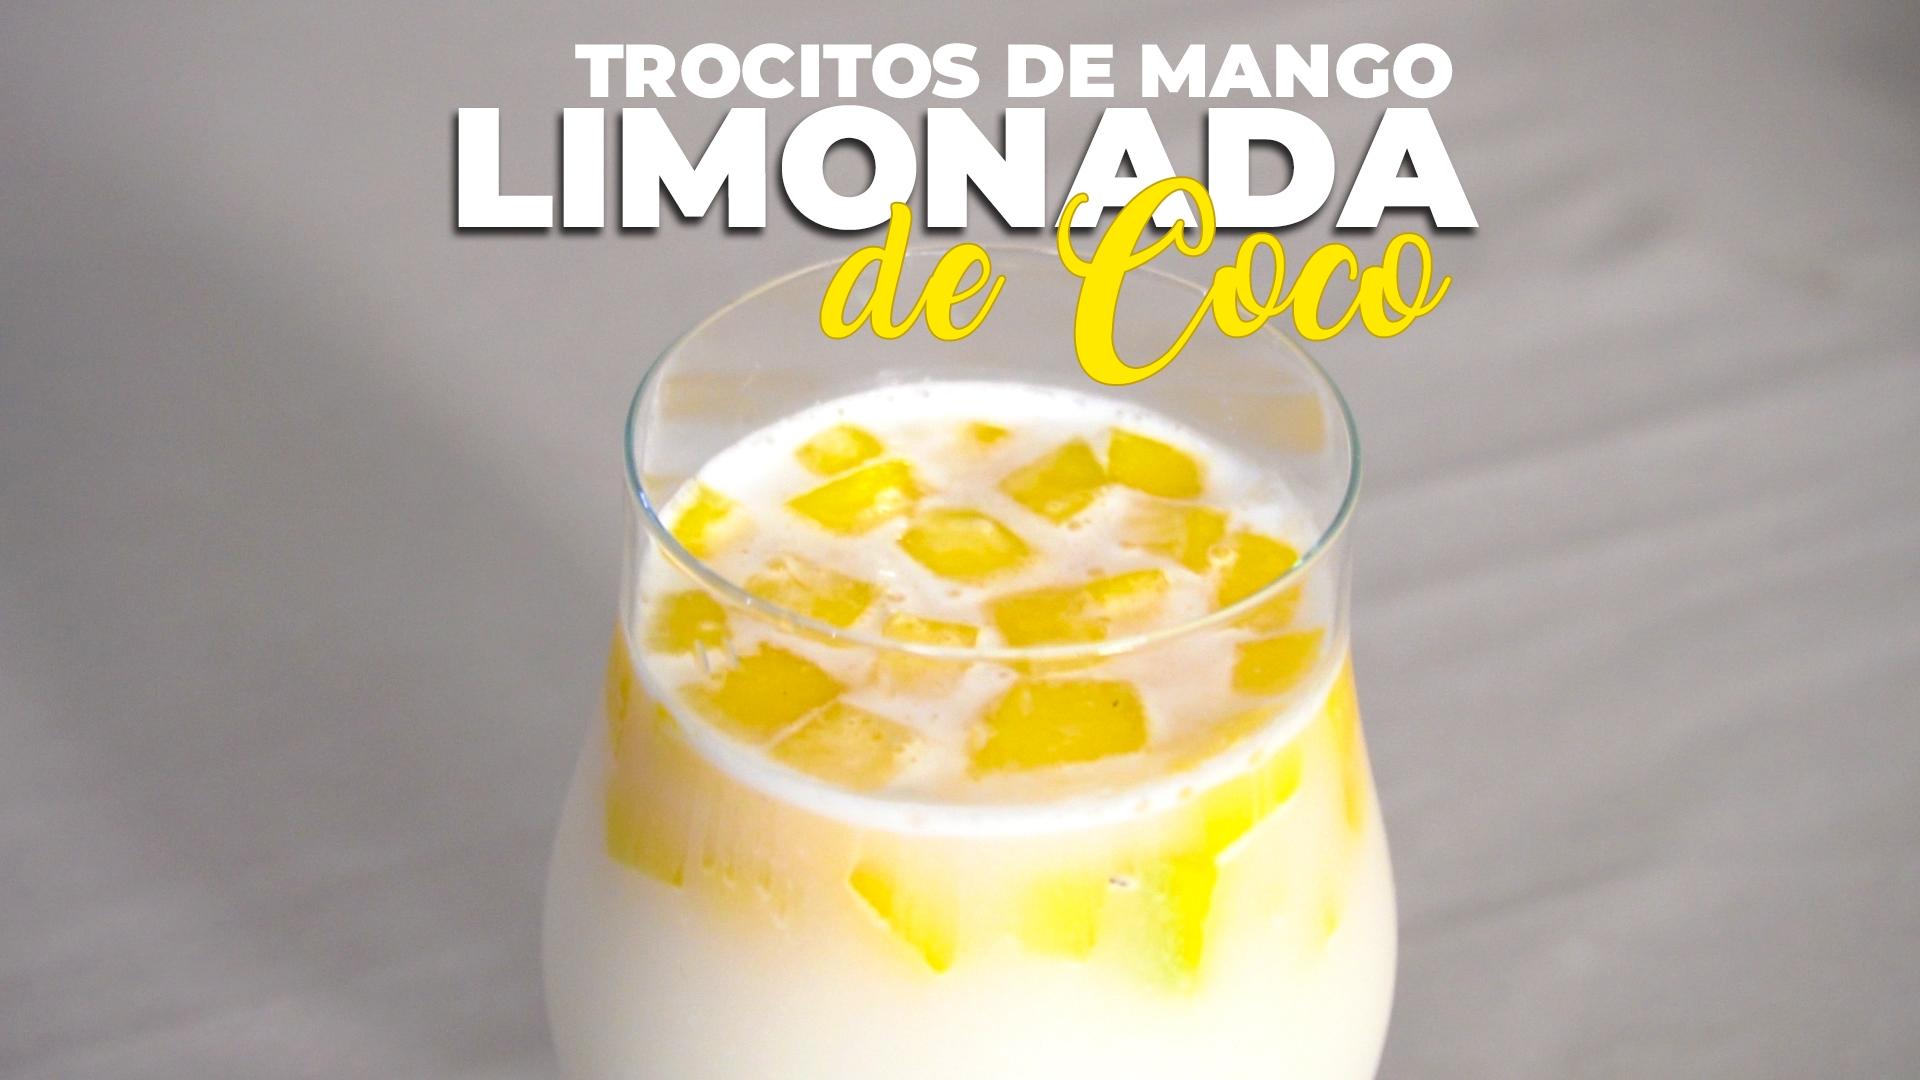 Limonada de Coco con Mango